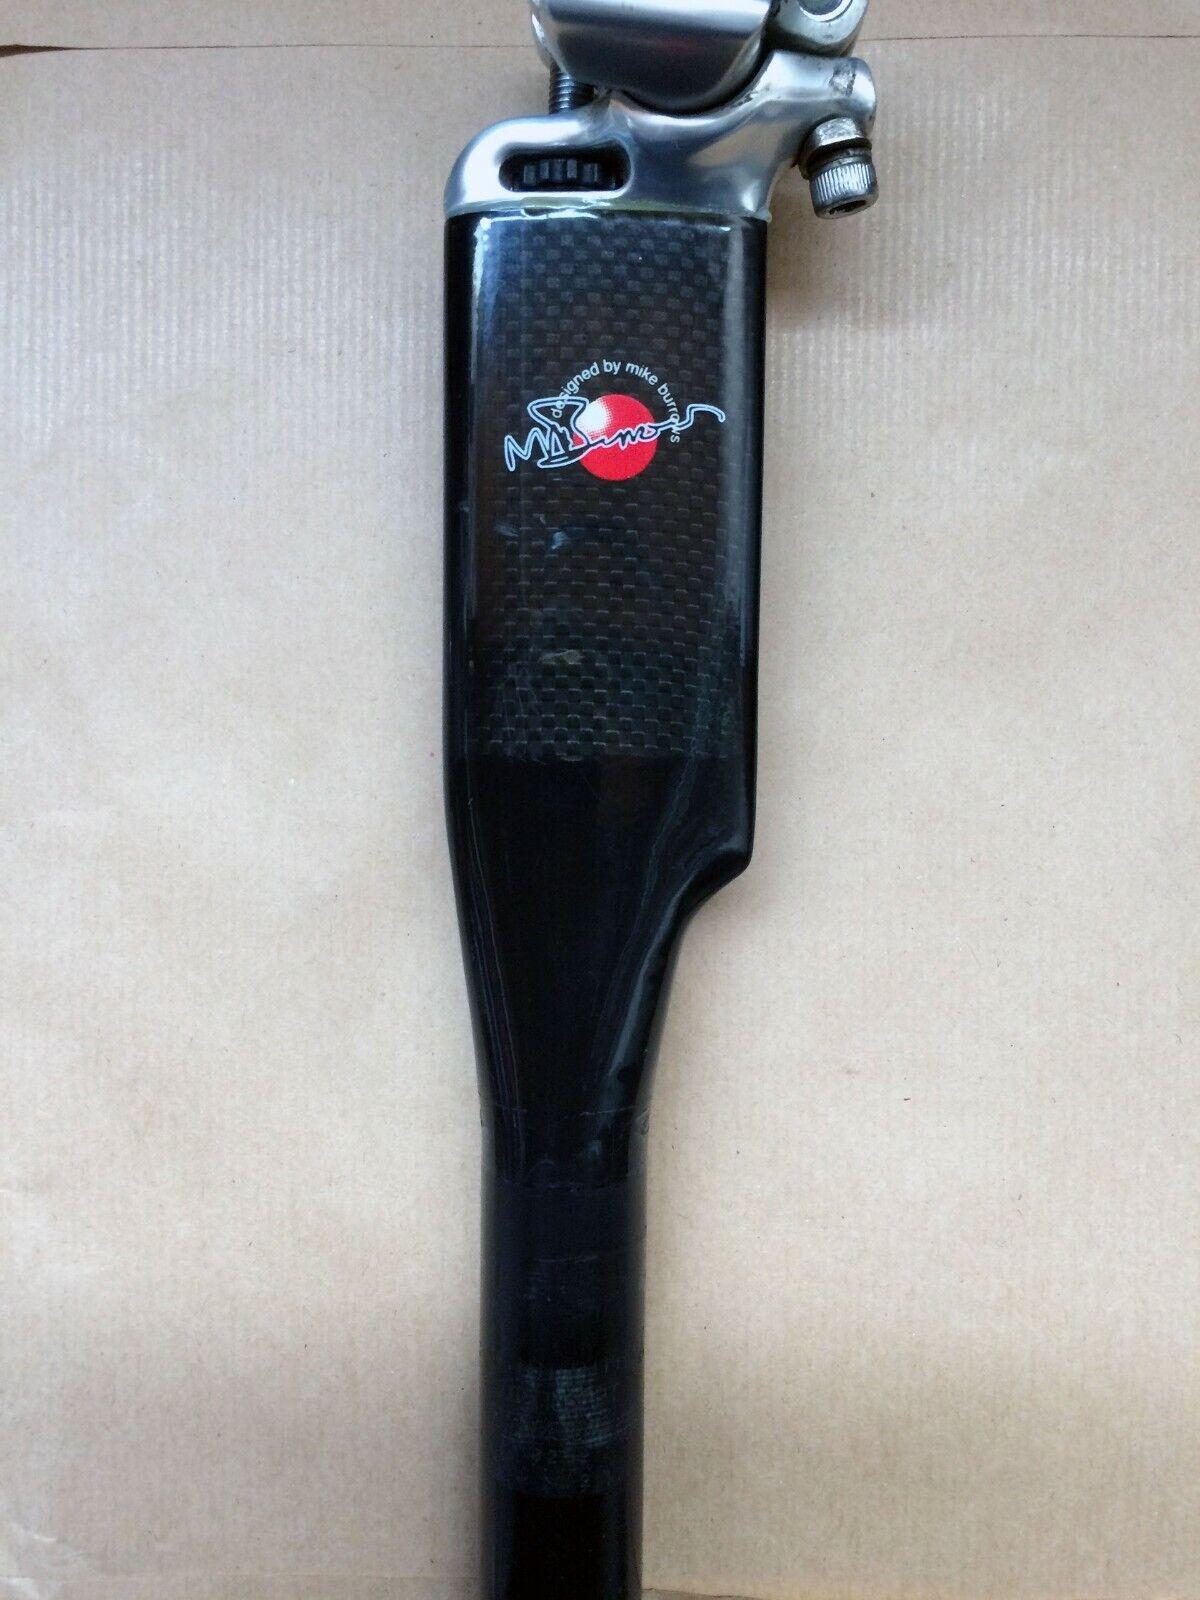 Seatpost mike burrows carbon fiber 27,2mm